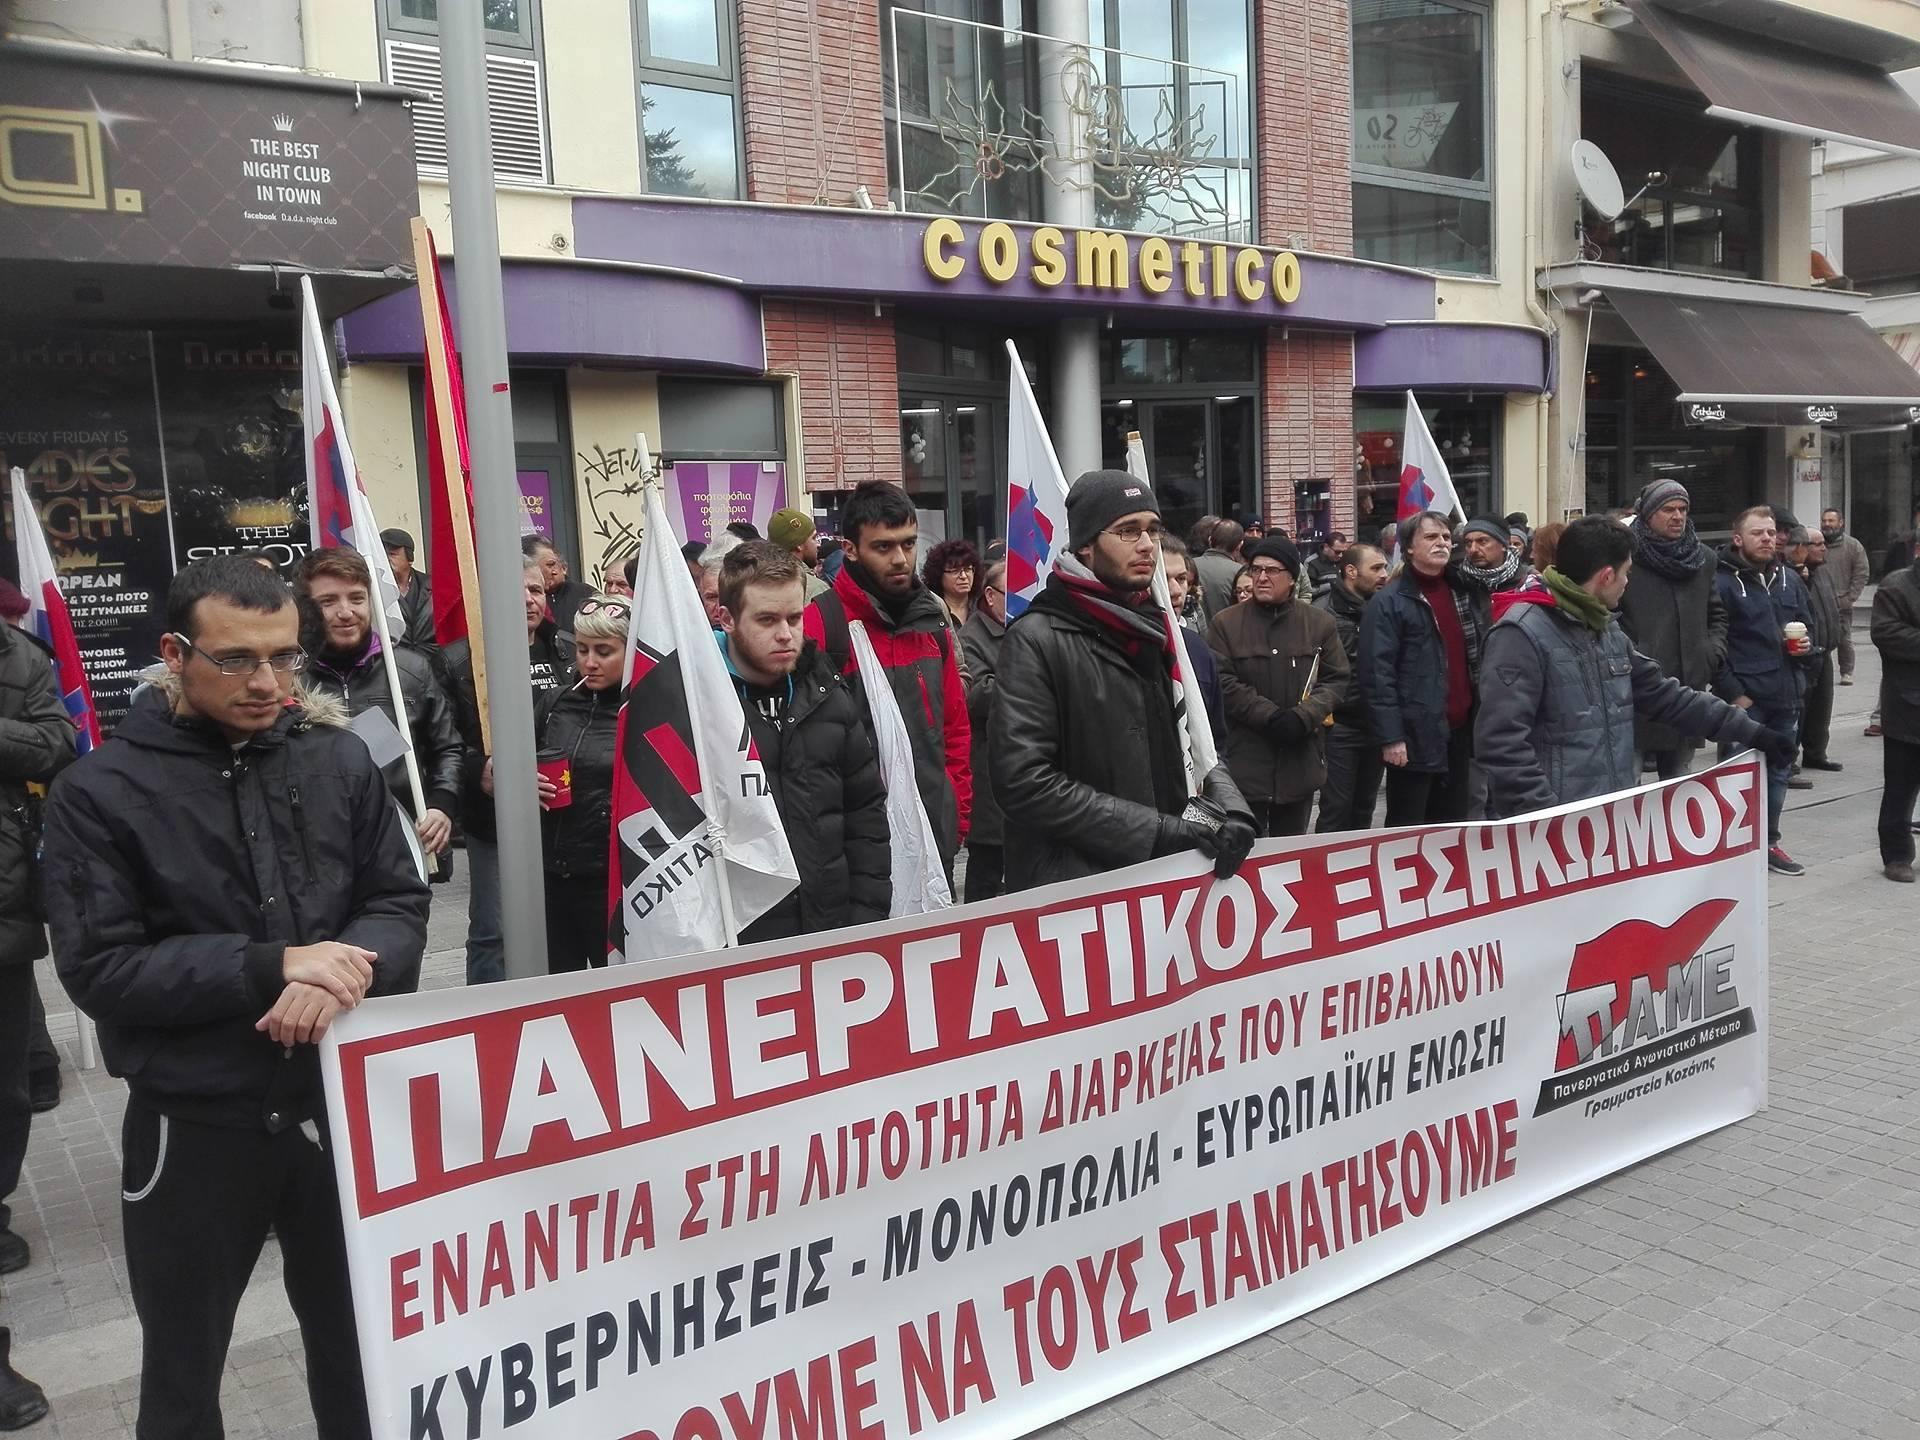 kozan.gr: H σημερινή απεργιακή συγκέντρωση & πορεία του ΠΑΜΕ στην Κοζάνη (Φωτογραφίες & Βίντεο)